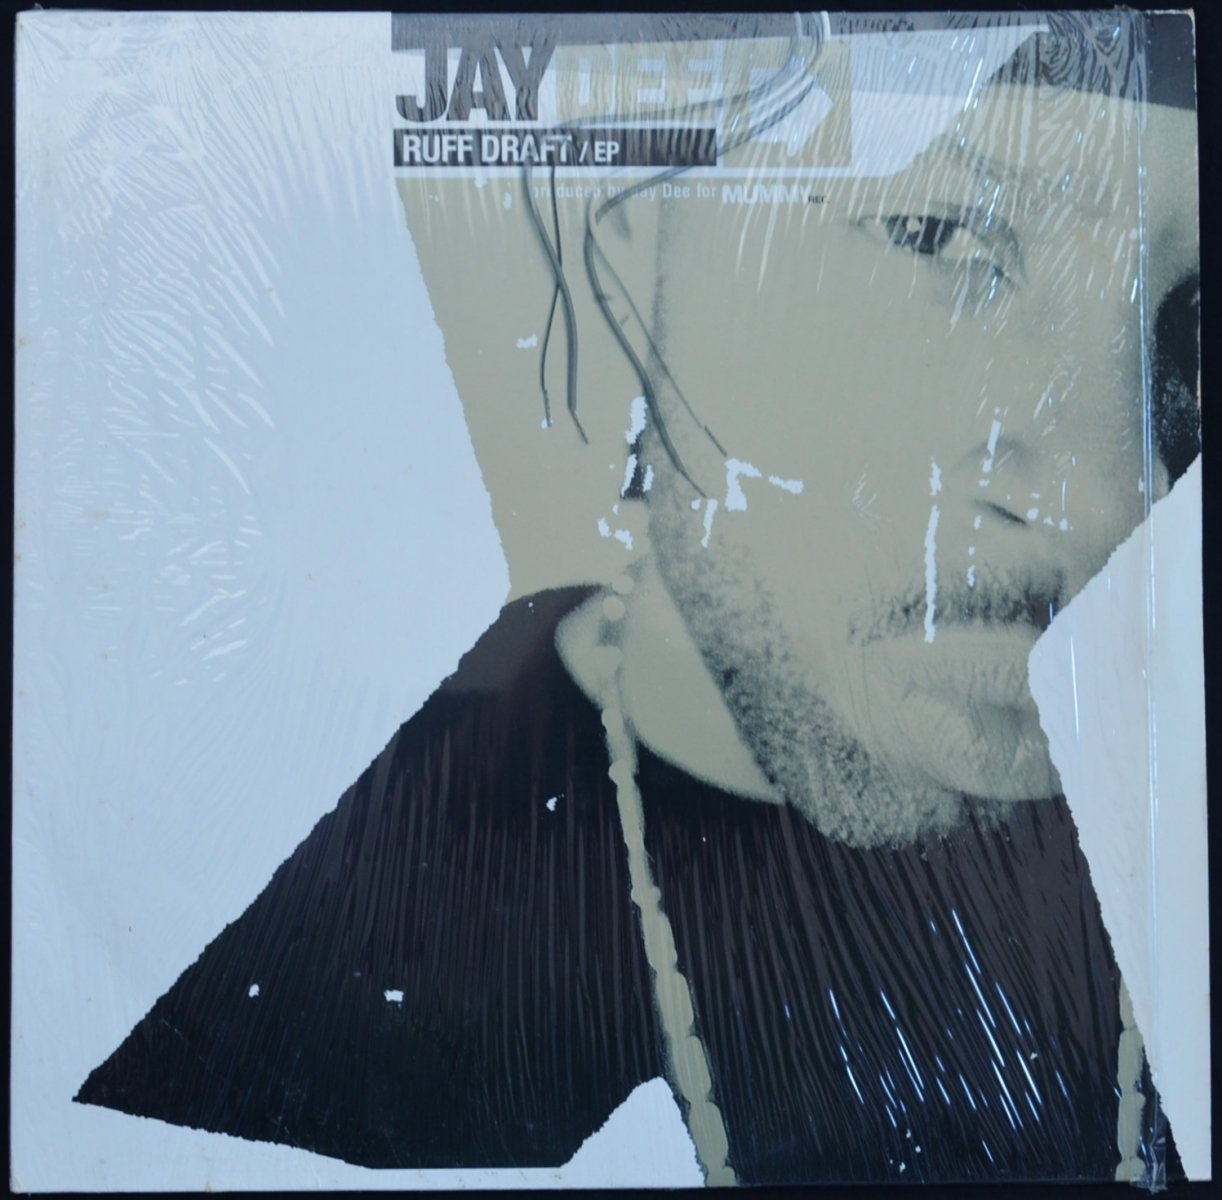 JAY DEE / RUFF DRAFT EP (12